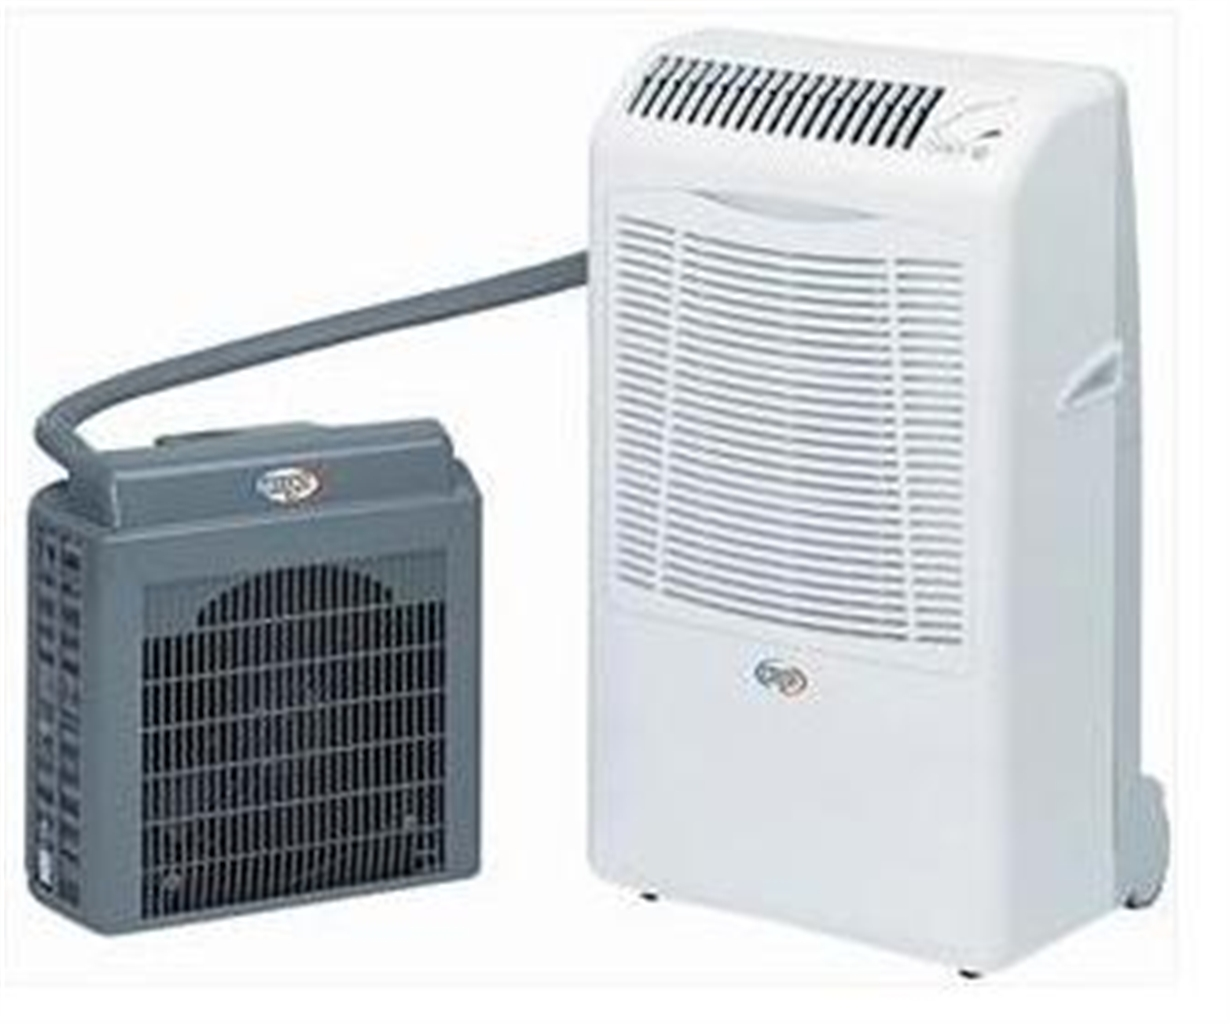 argo oscar twin 14 mobiele airco klimaat totaal koeltechniek airconditioning verkoop. Black Bedroom Furniture Sets. Home Design Ideas